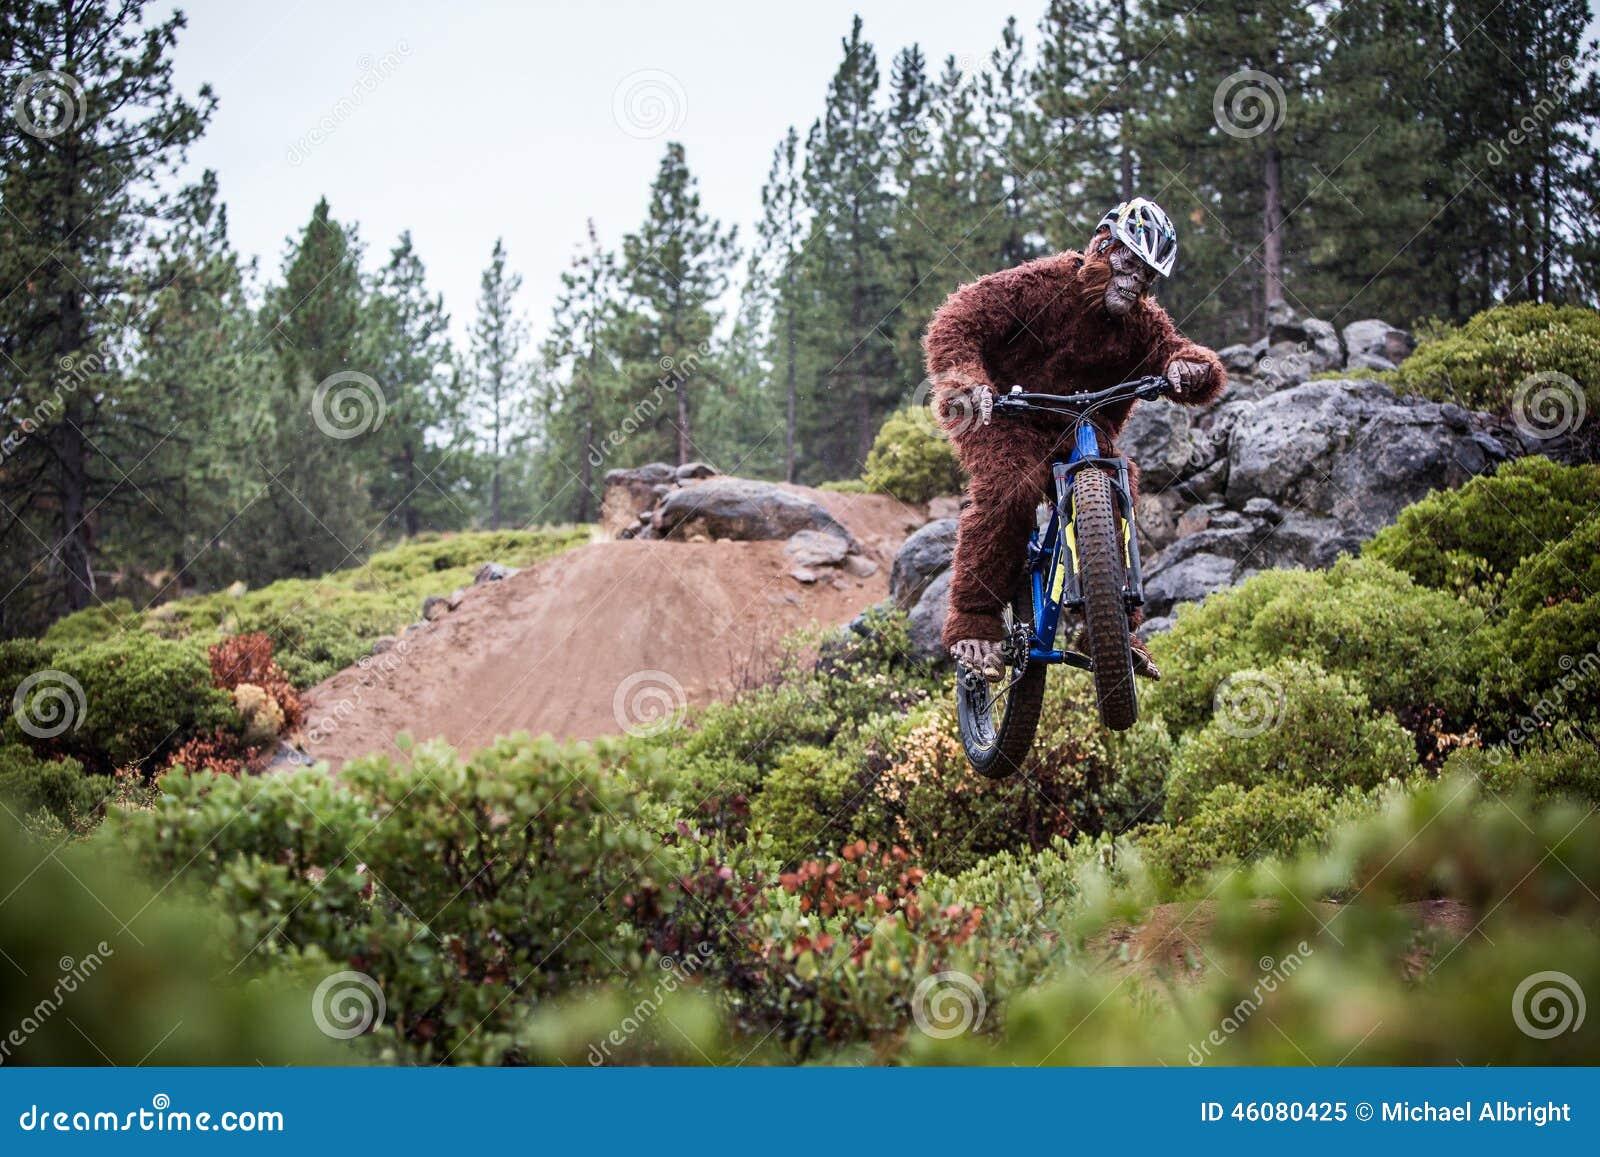 Sasquatch (yeti) salta una bicicleta en el aire